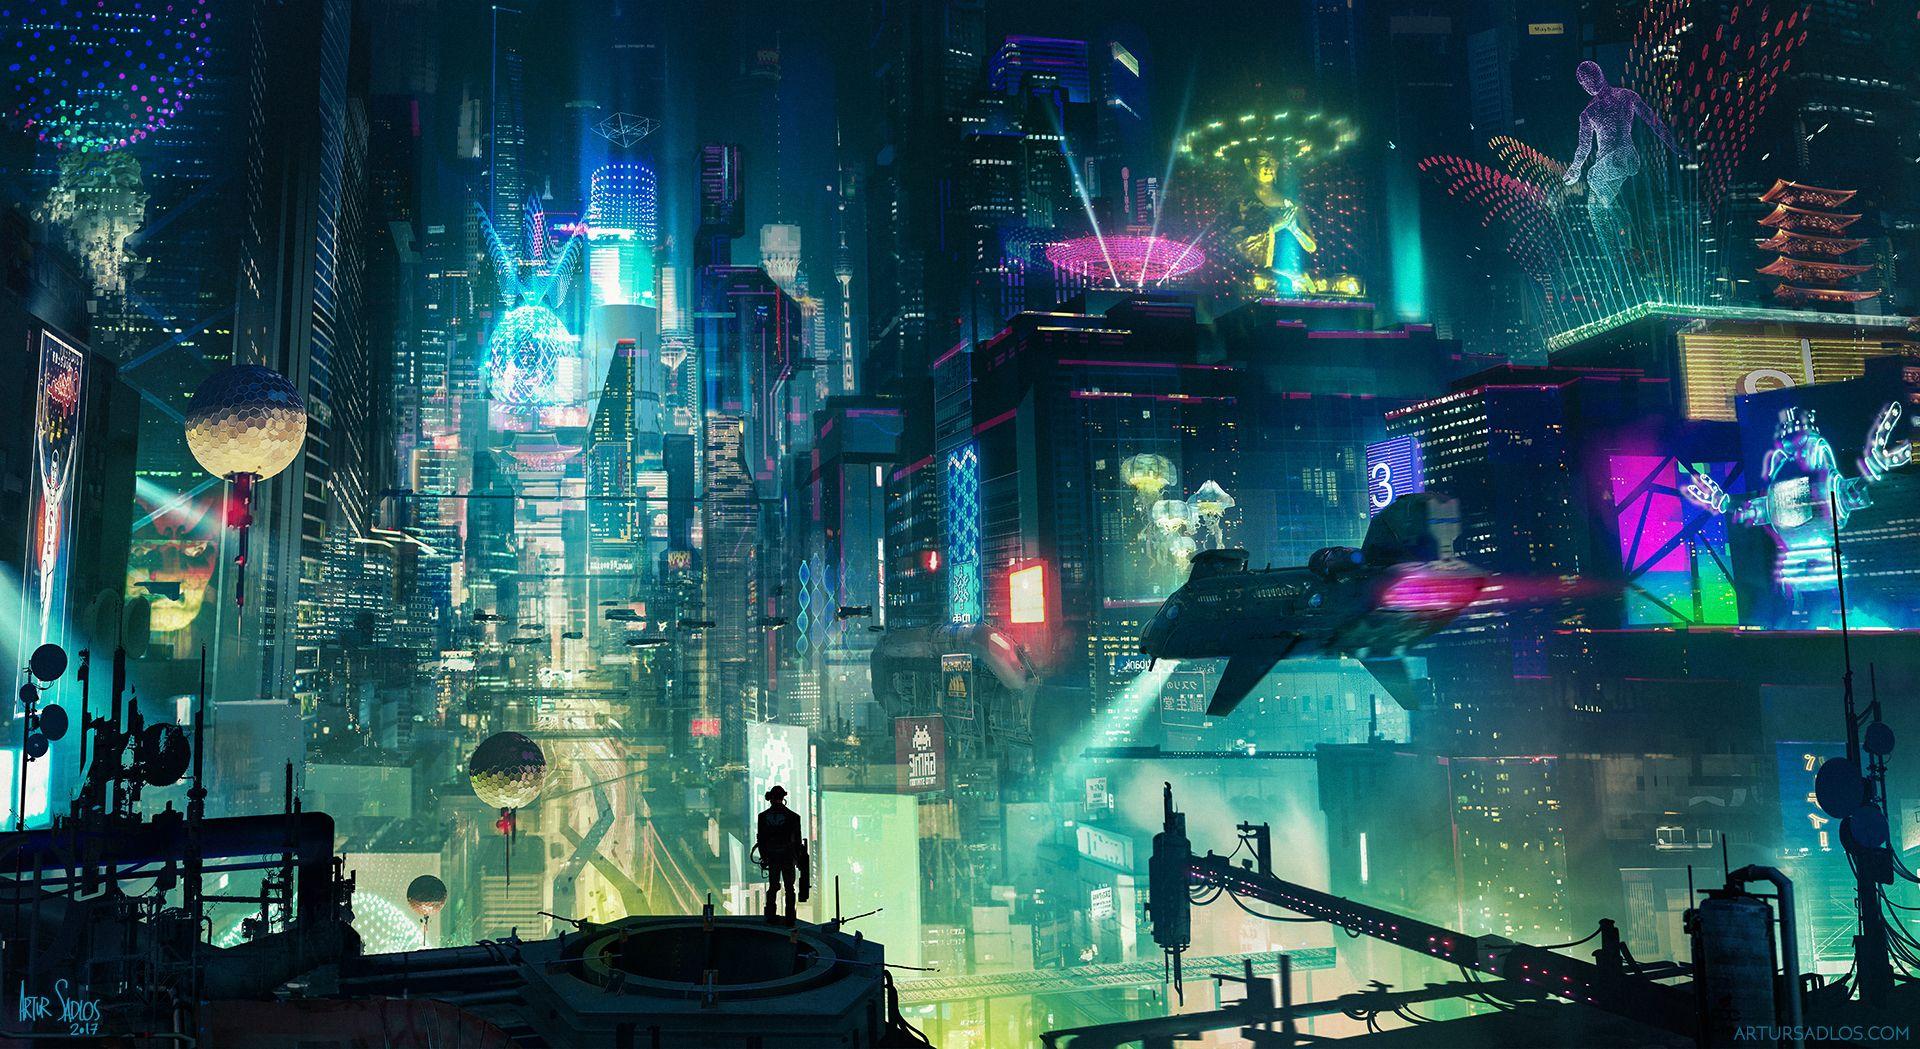 Cyberpunk City Digital 19x1080 Repin And Follow デジタル画 サイバーパンクシティ Sf 背景